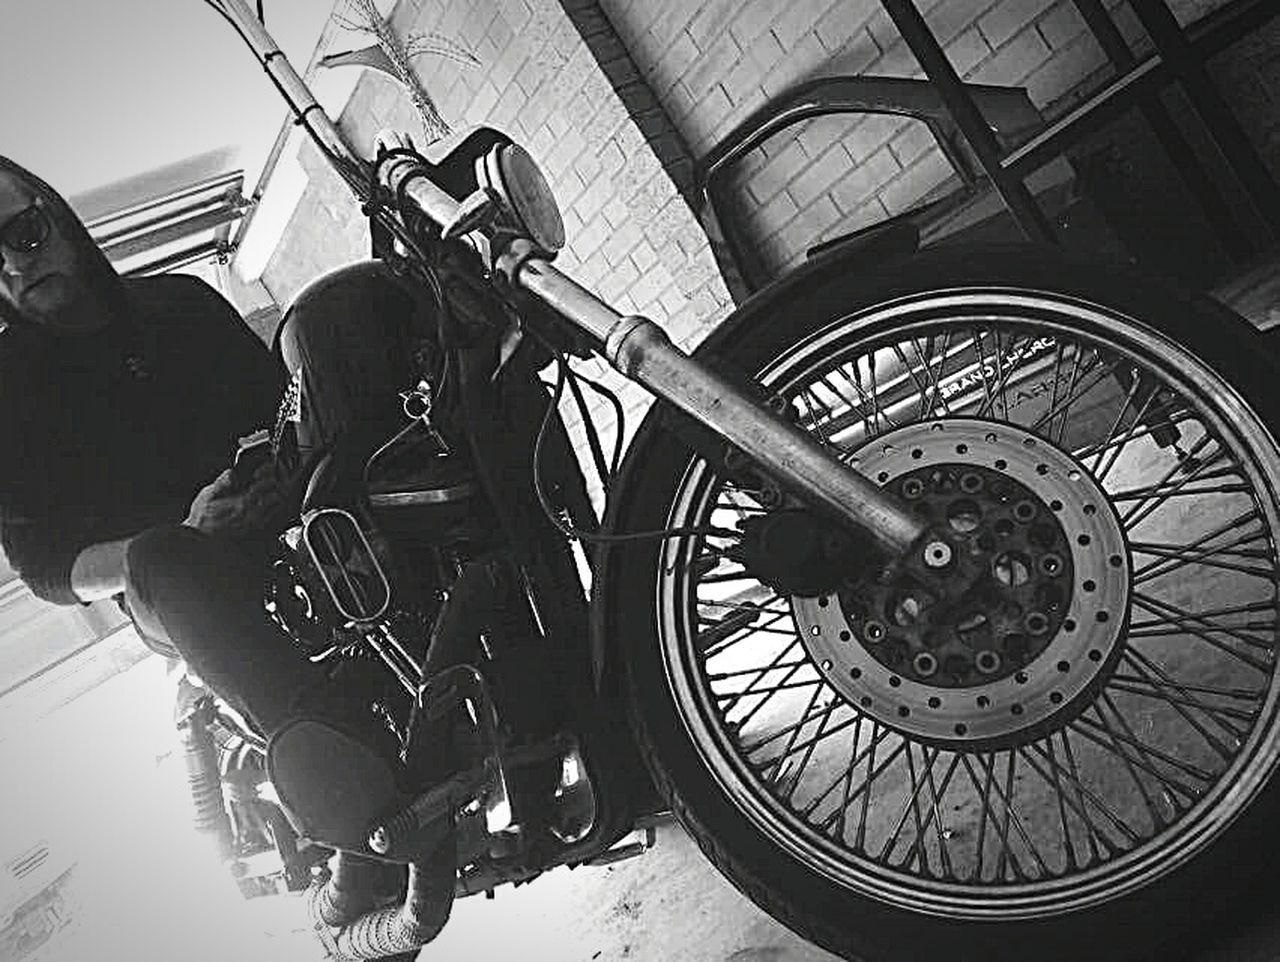 Harleydavidson Bikes Riding Ridersonthestorm Taking Photos Enjoying Life Photo Of The Day CreativePhotographer Photooftheday Photoart Photography Androidography Professionalphotography FacesOfEyeEm Self Portrait Letmetakeaselfie Faces Of EyeEm Cheese! Check This Out Eye Em Best Shots That's Me Blackandwhite Highlife Hustling Roadtrip